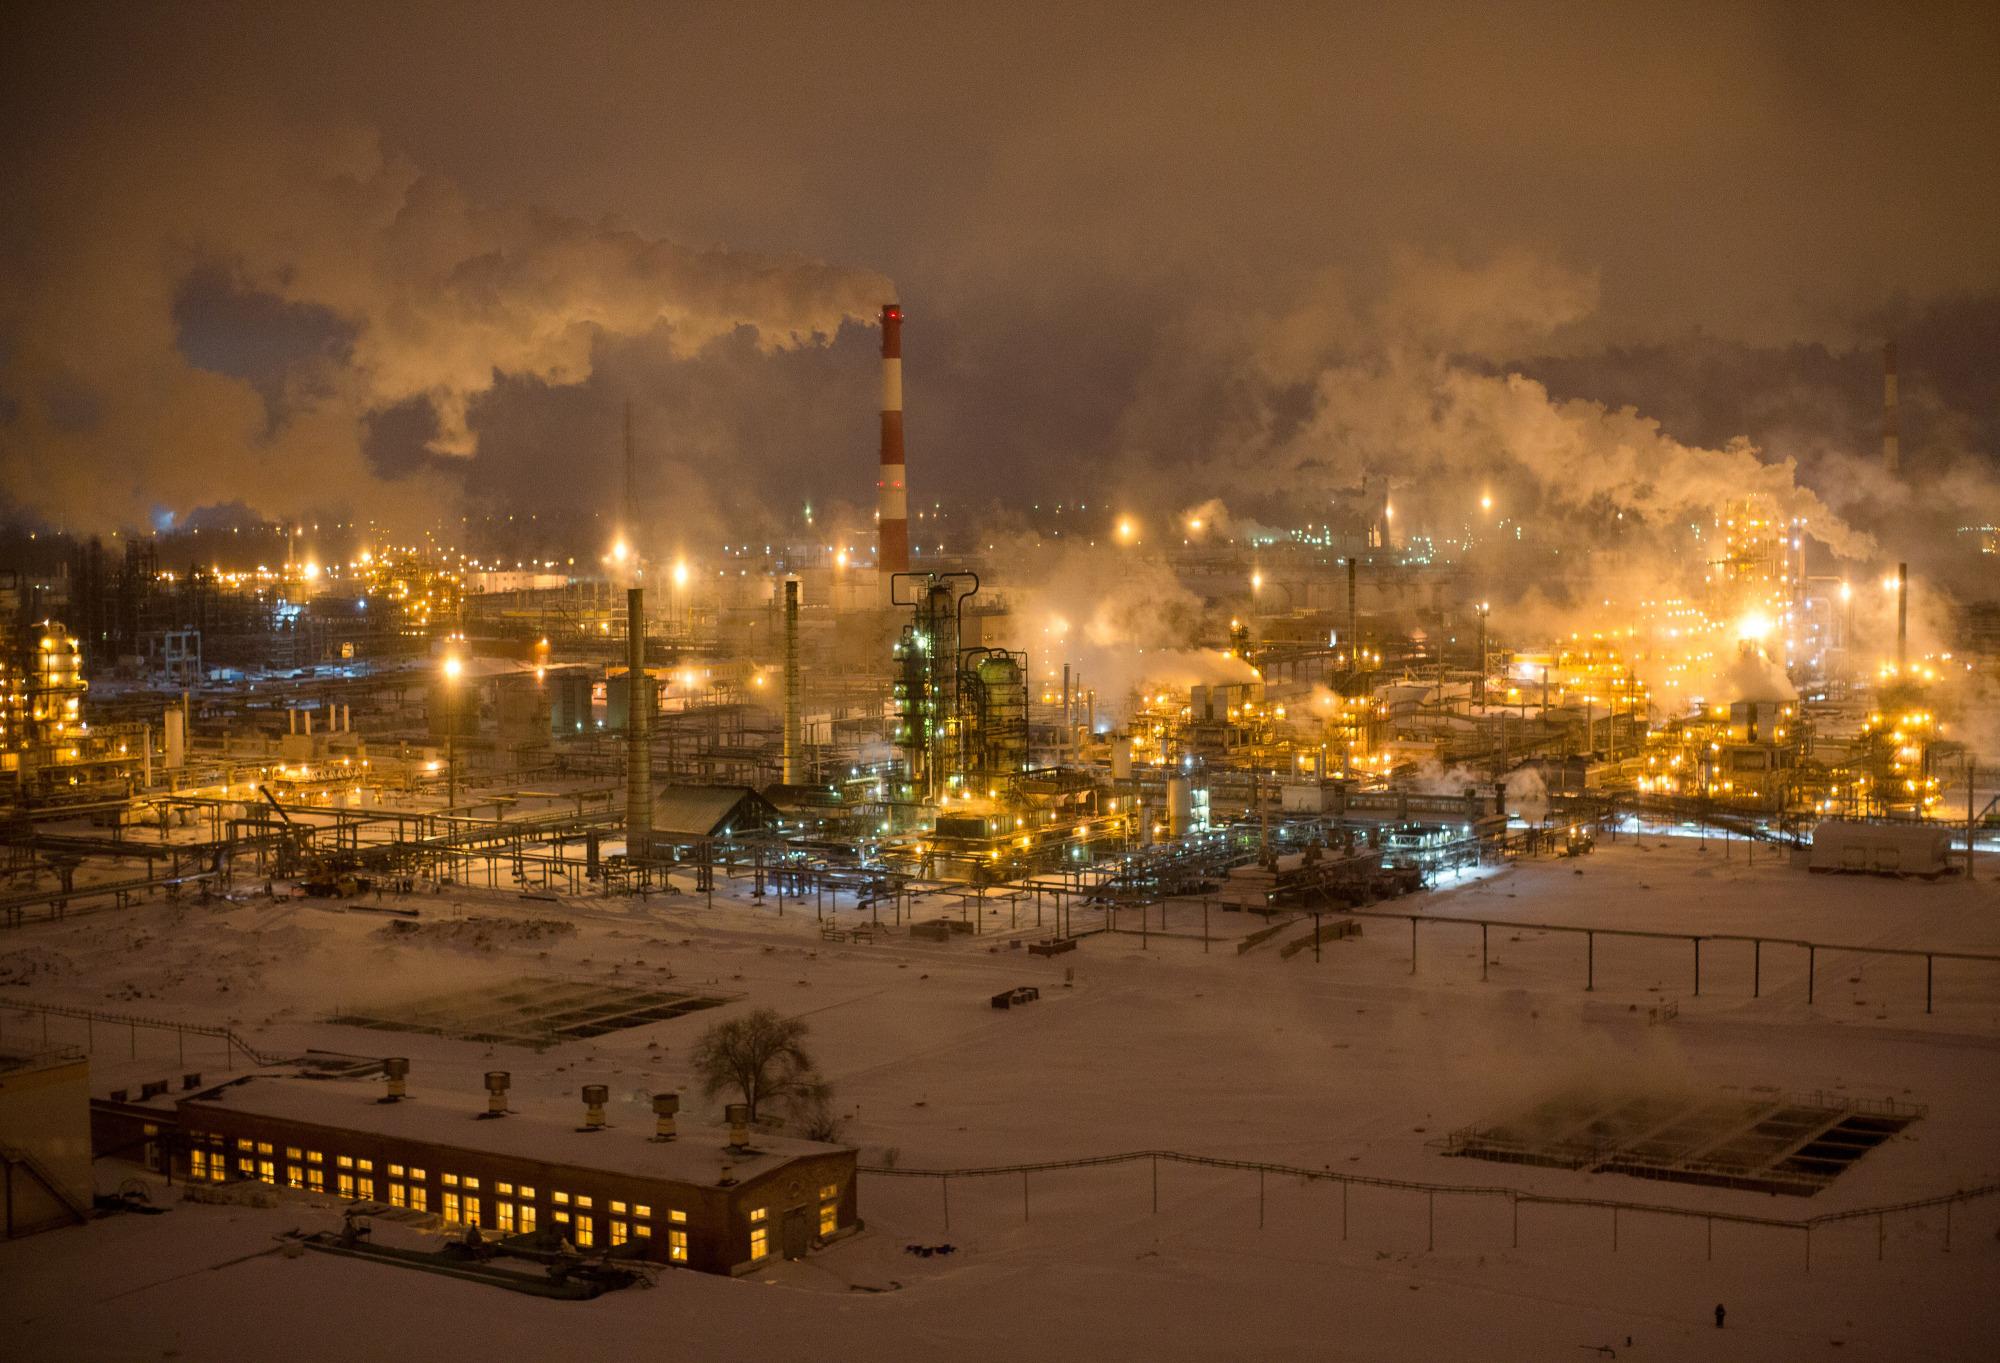 Inside Rosneft PJSC's Neftepererabotka Downstream Oil Refinery As Non-OPEC Members Pledge To Trim Supply